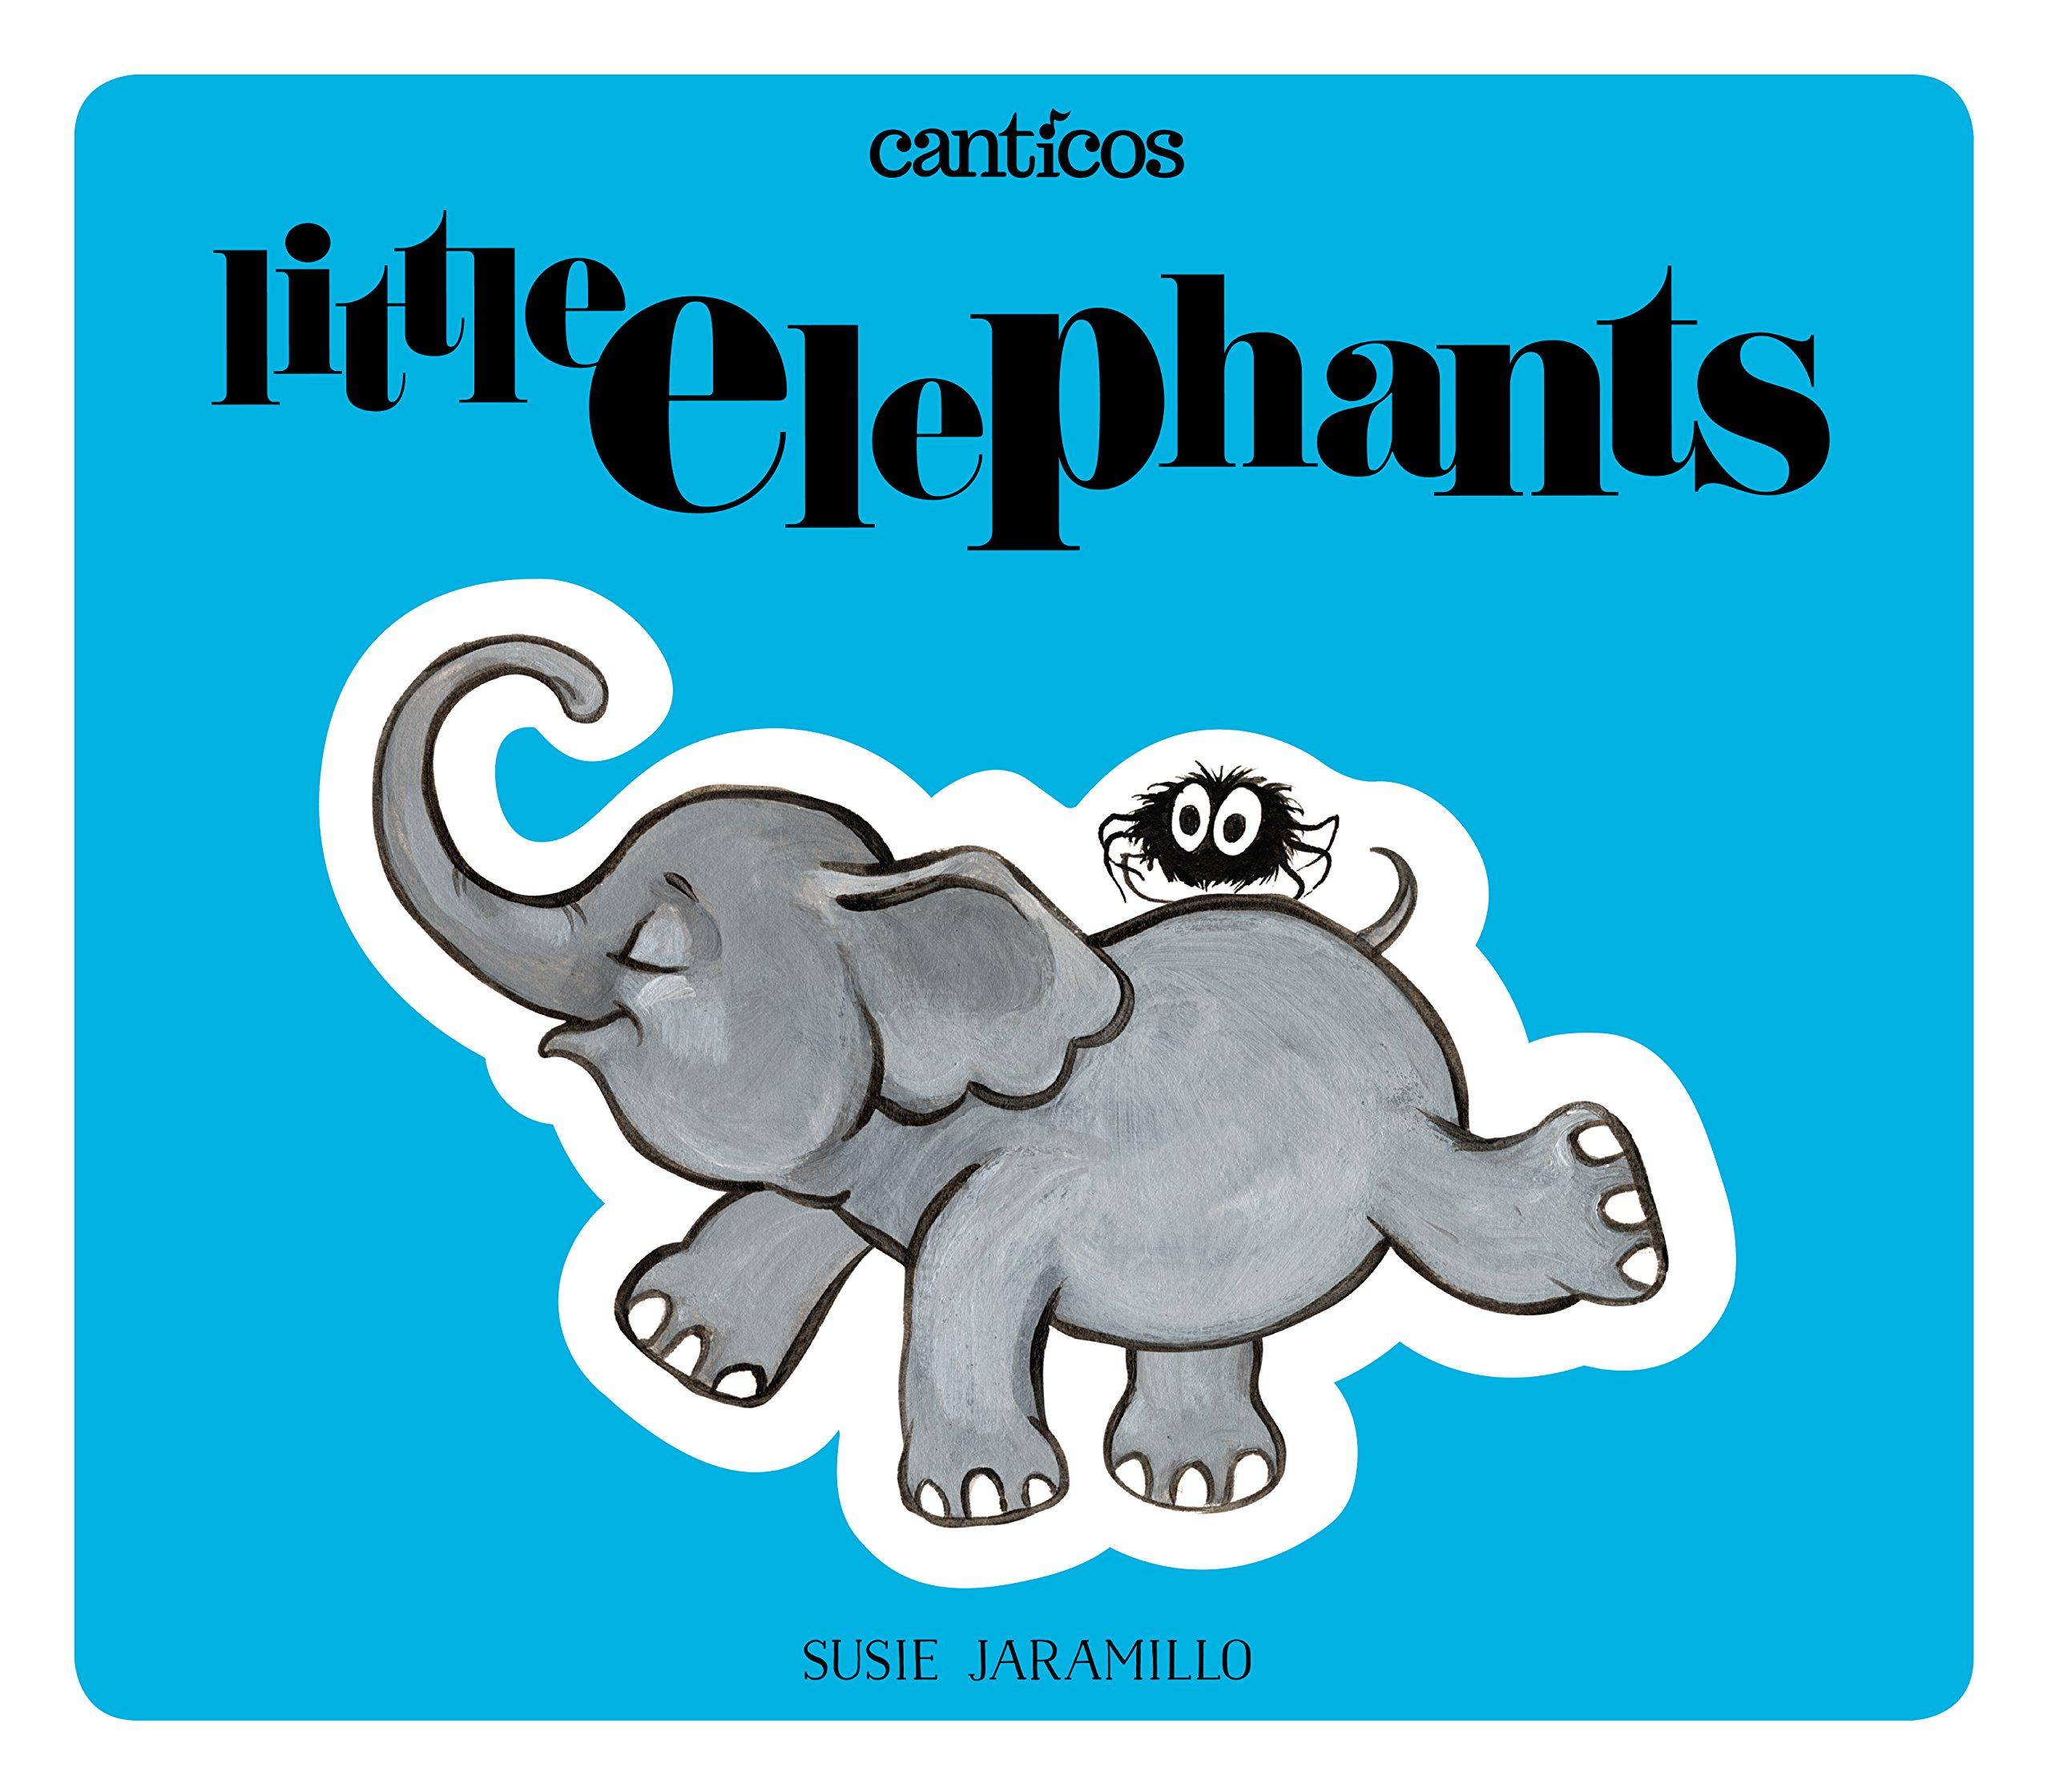 Amazon Little Elephants Elefantitos A Bilingual Lift The Flap Book Canticos 9780996995917 Susie Jaramillo Books